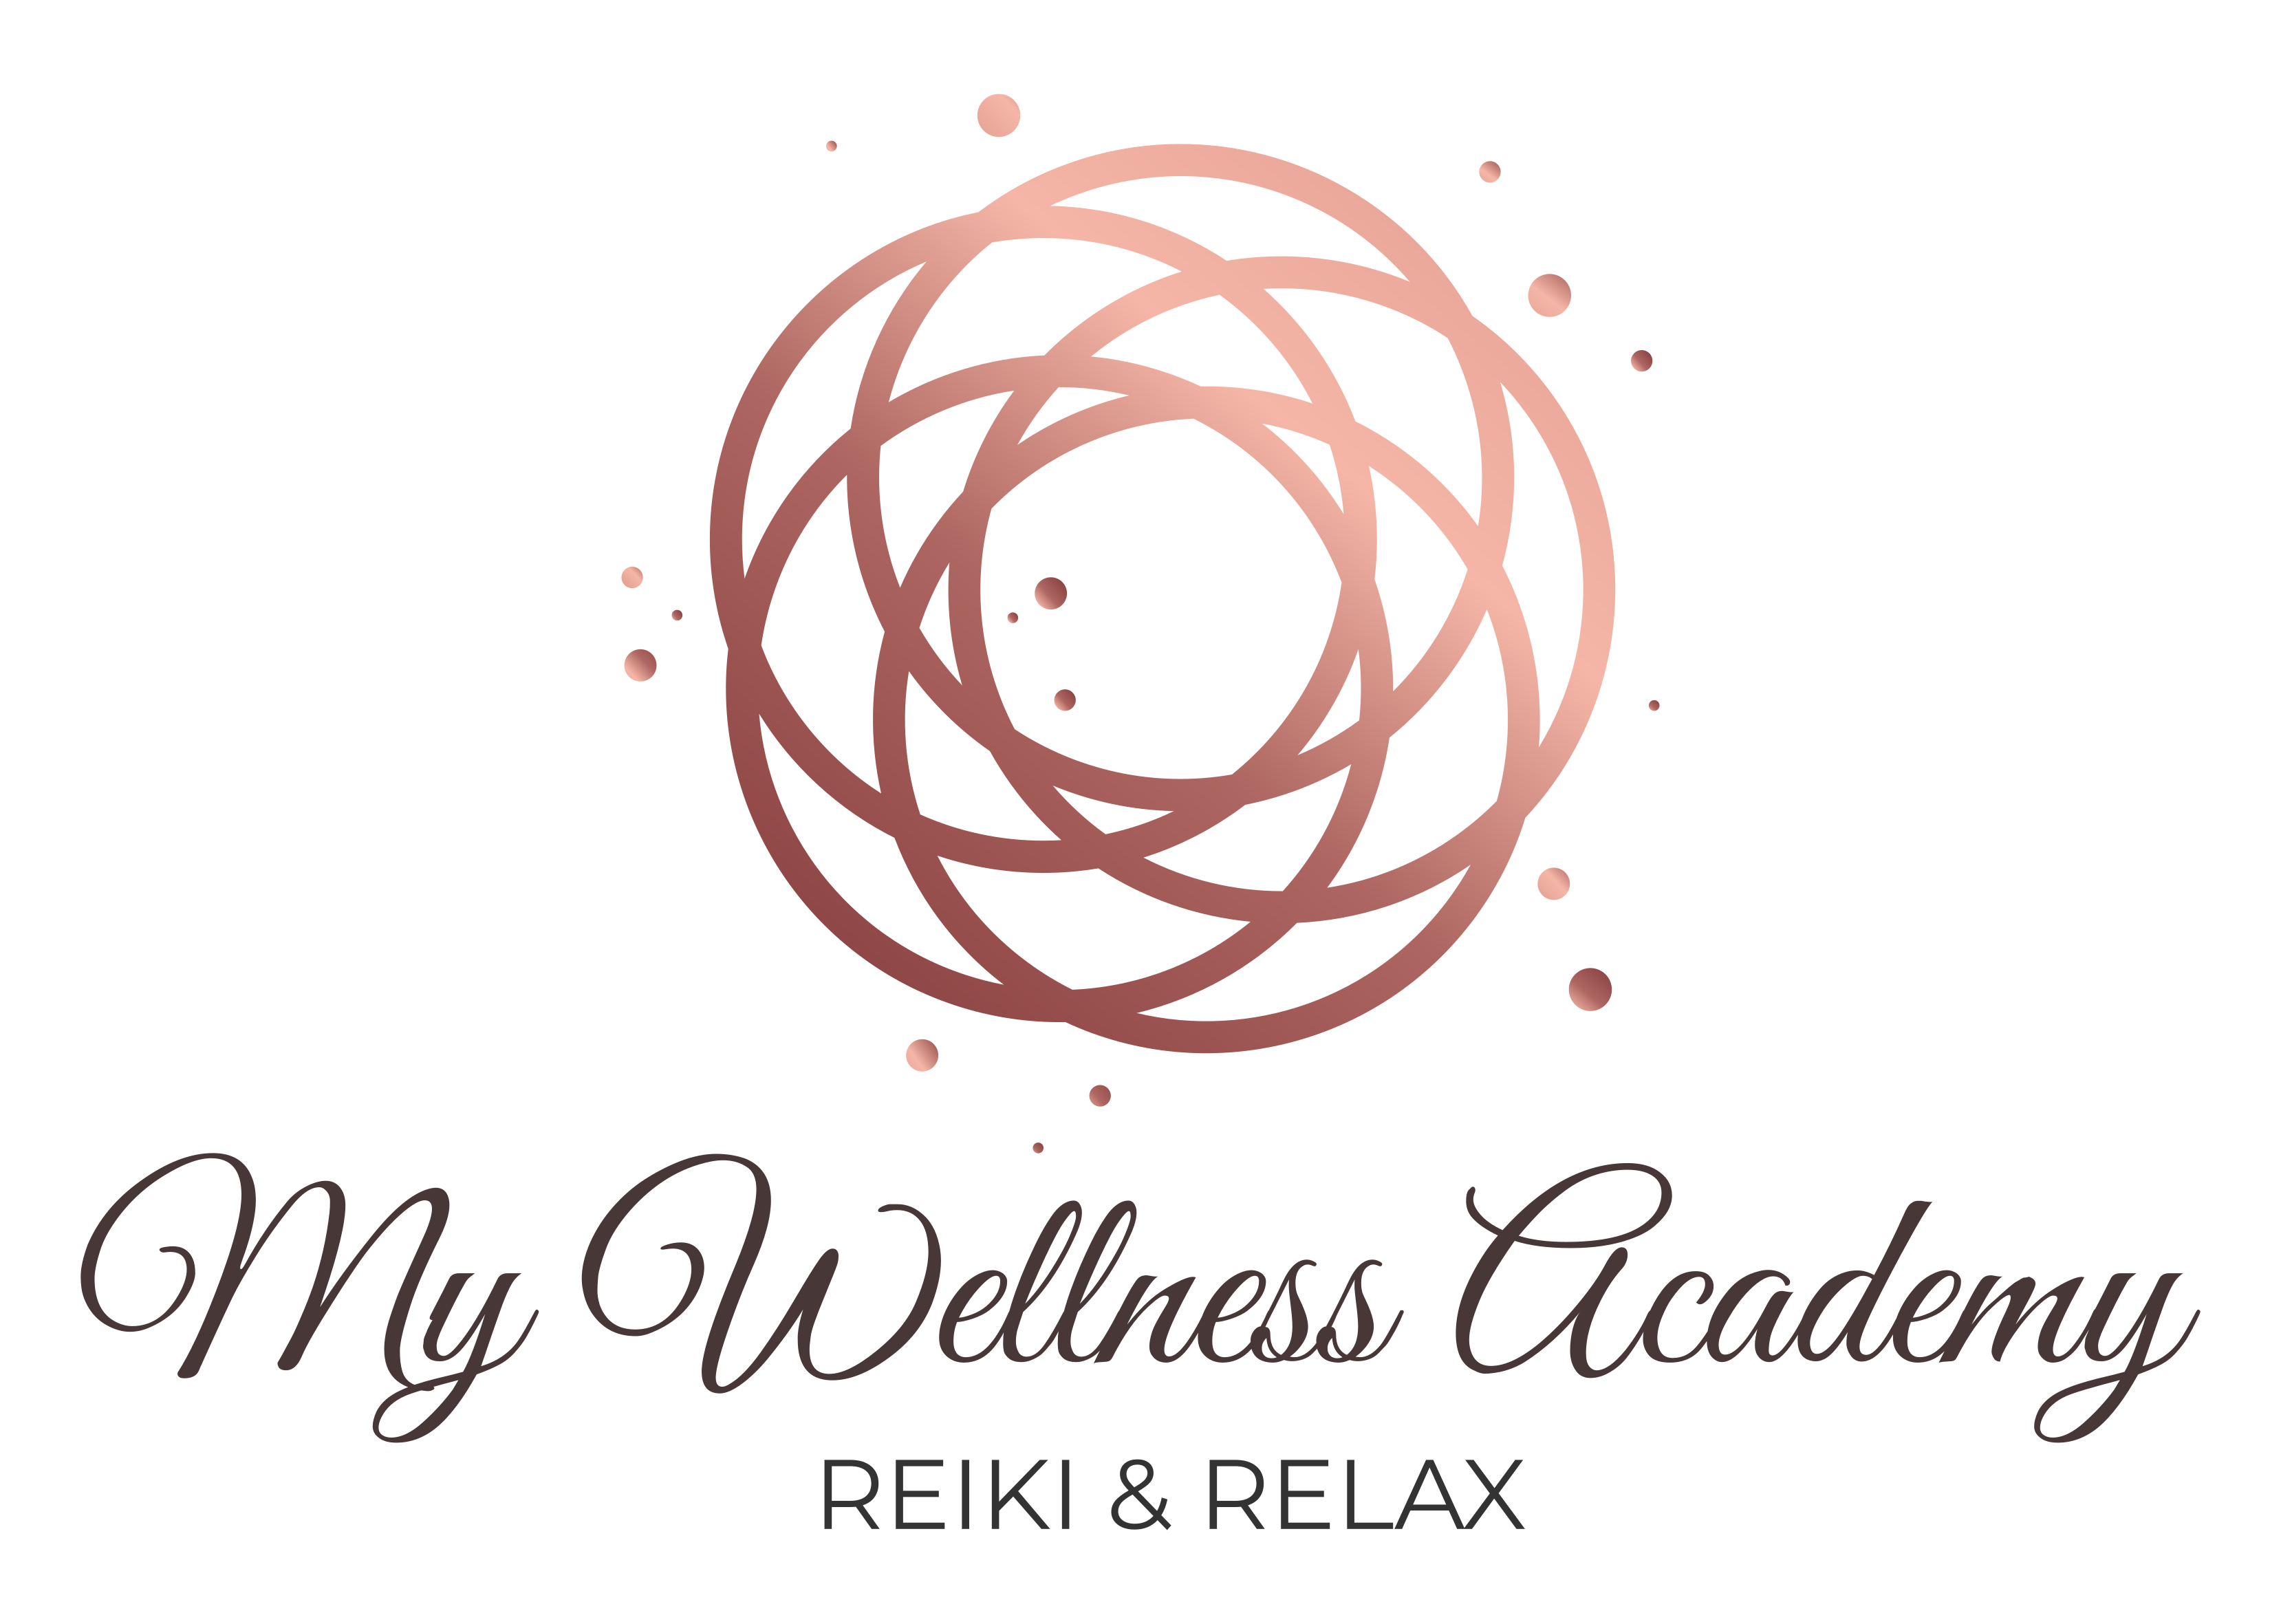 Michelle McIntyre - Wellness Academy